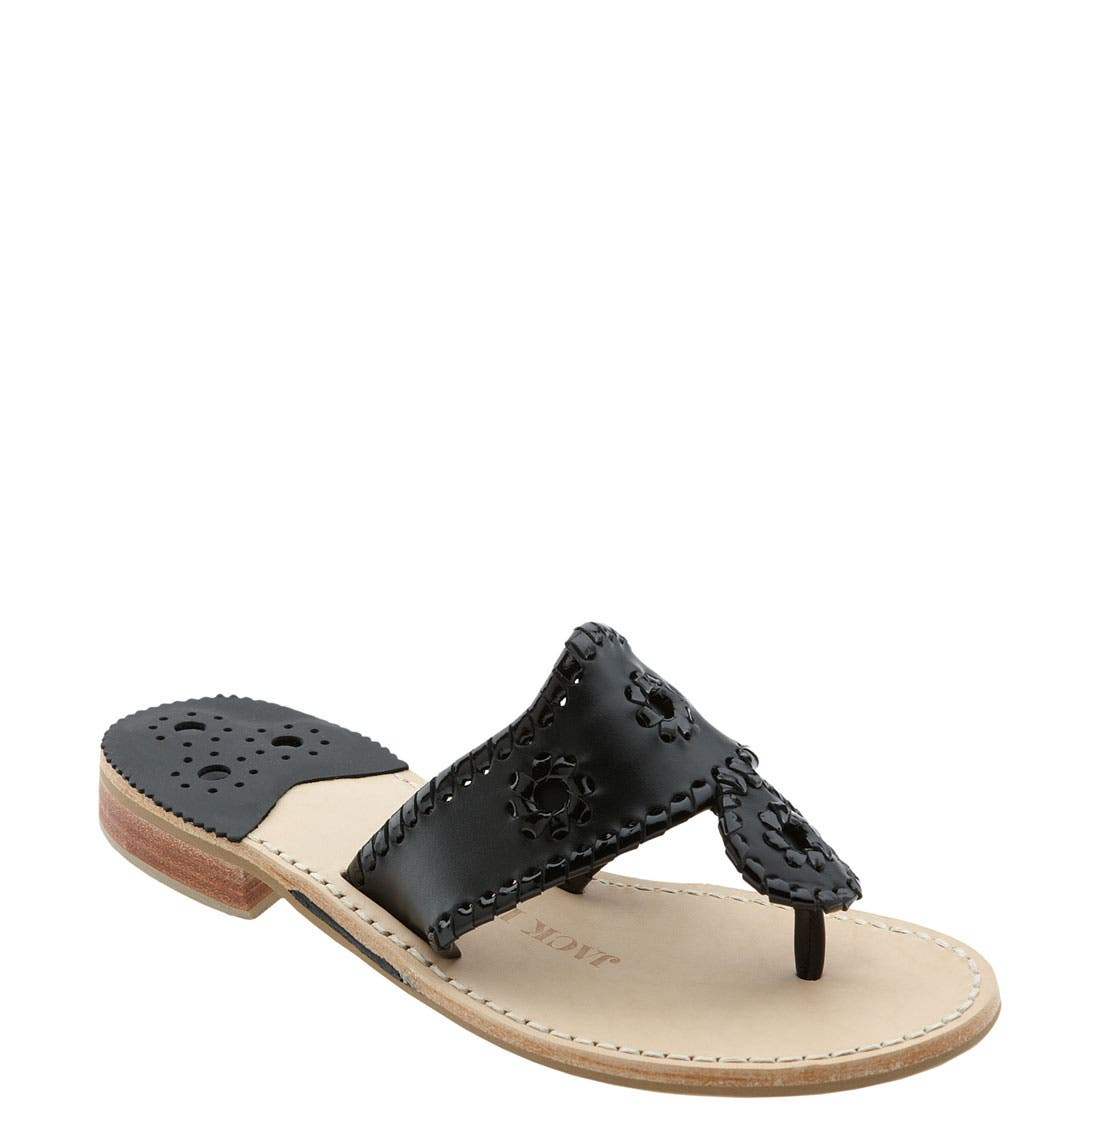 Palm Beach Whipstitch Thong Sandal in Black Black Patent